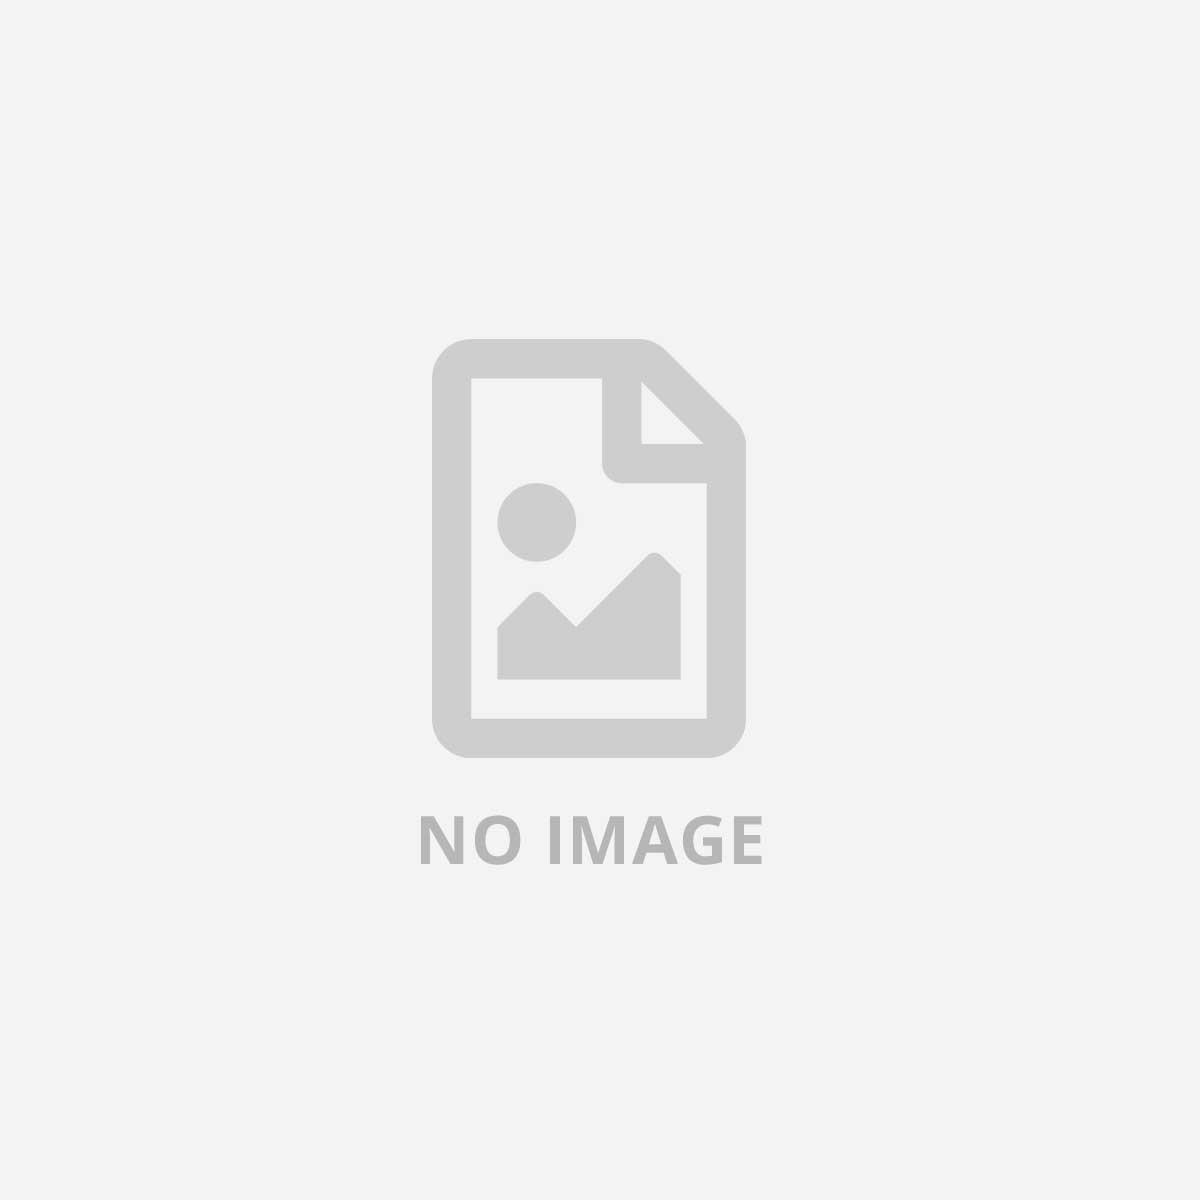 KINGSTON 2GB 1333MHZ DDR3 NON-ECC CL9 SODIMM